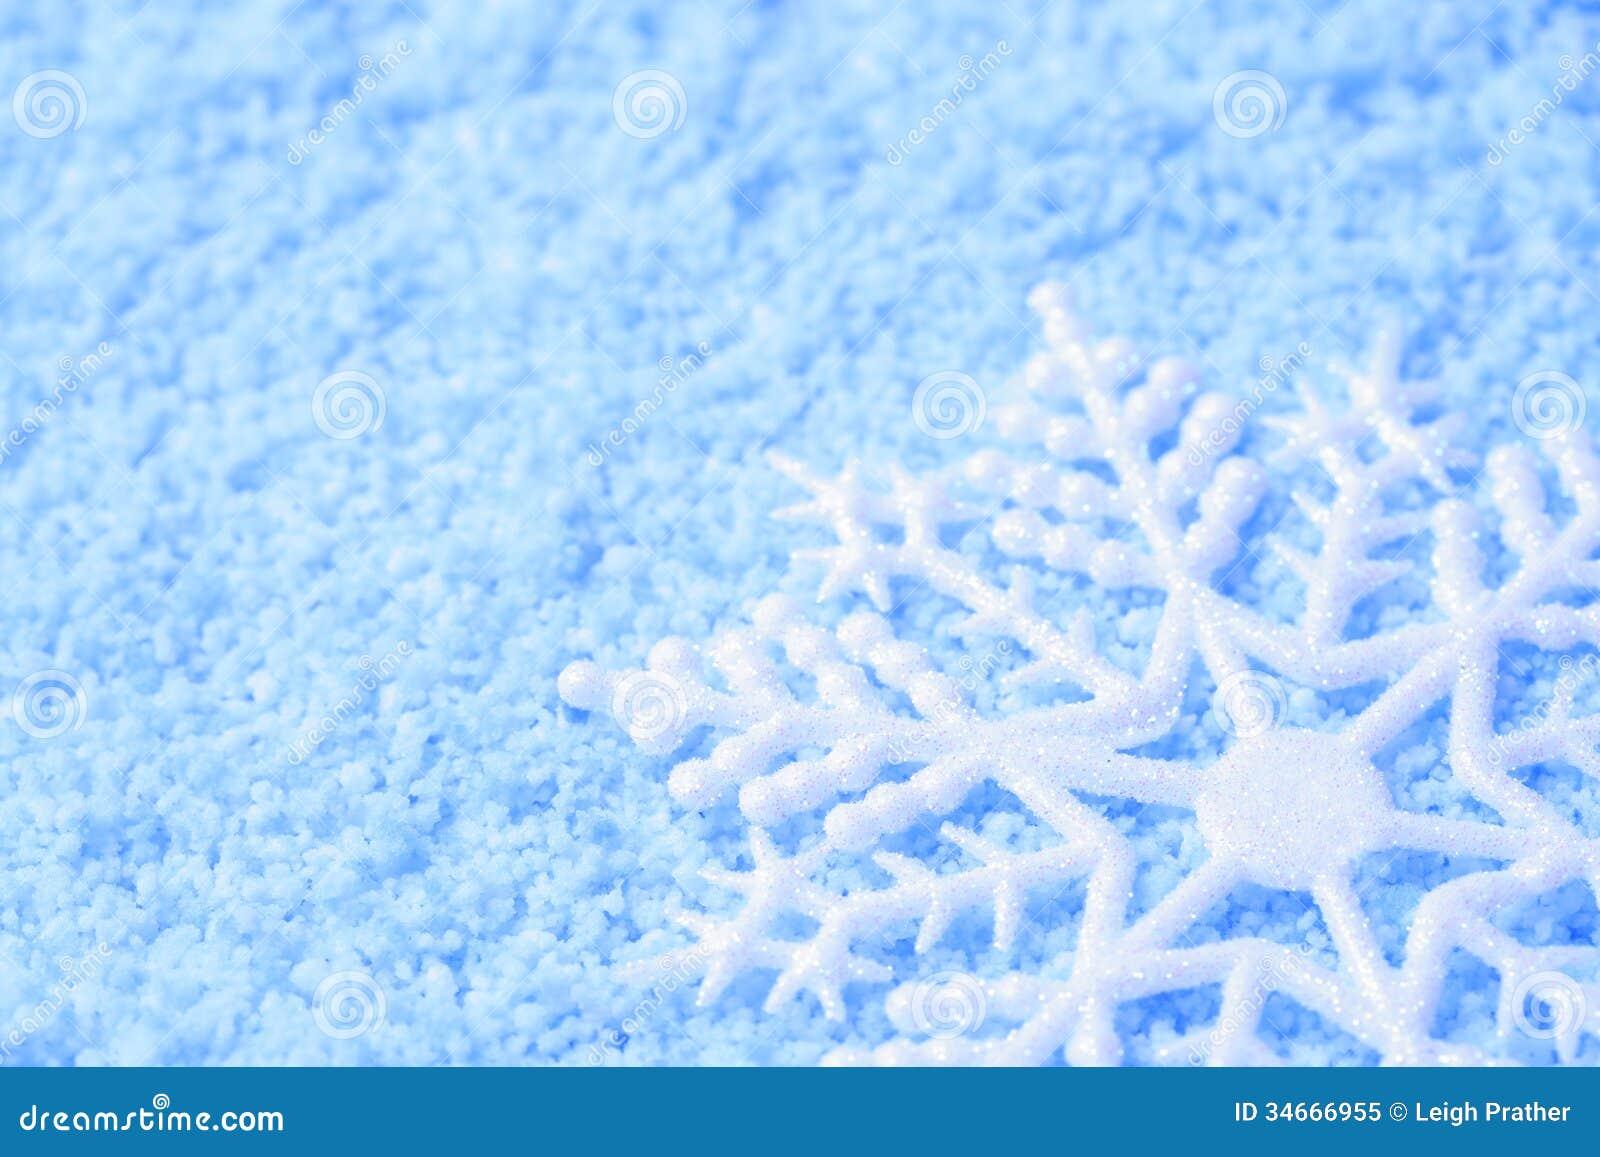 Christmas Blue Ornaments